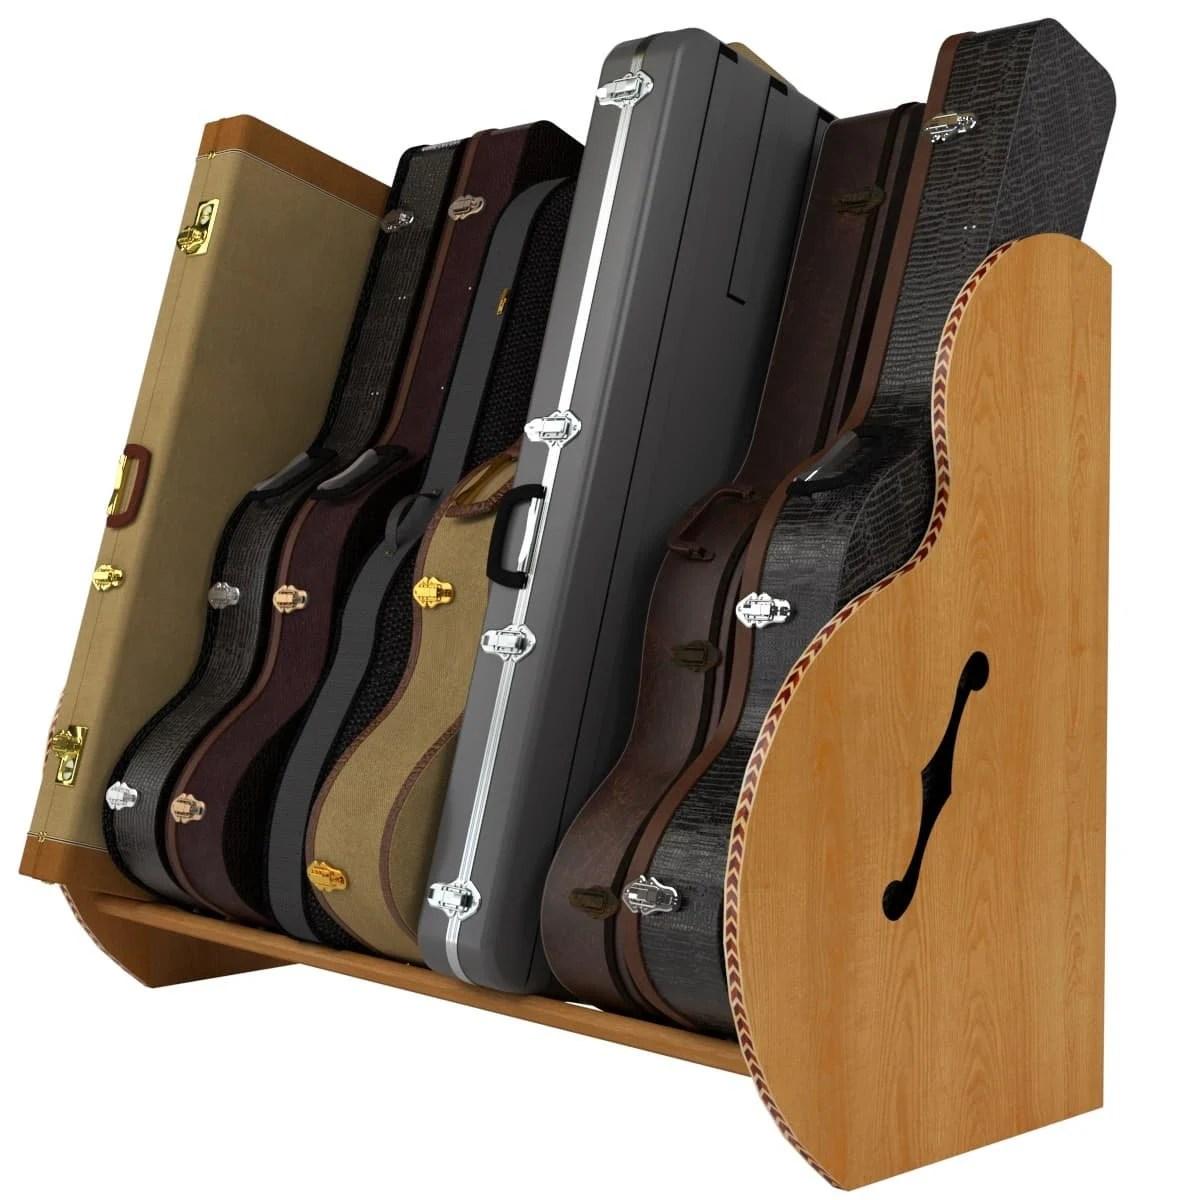 the studio deluxe multiple guitar case storage rack etsy